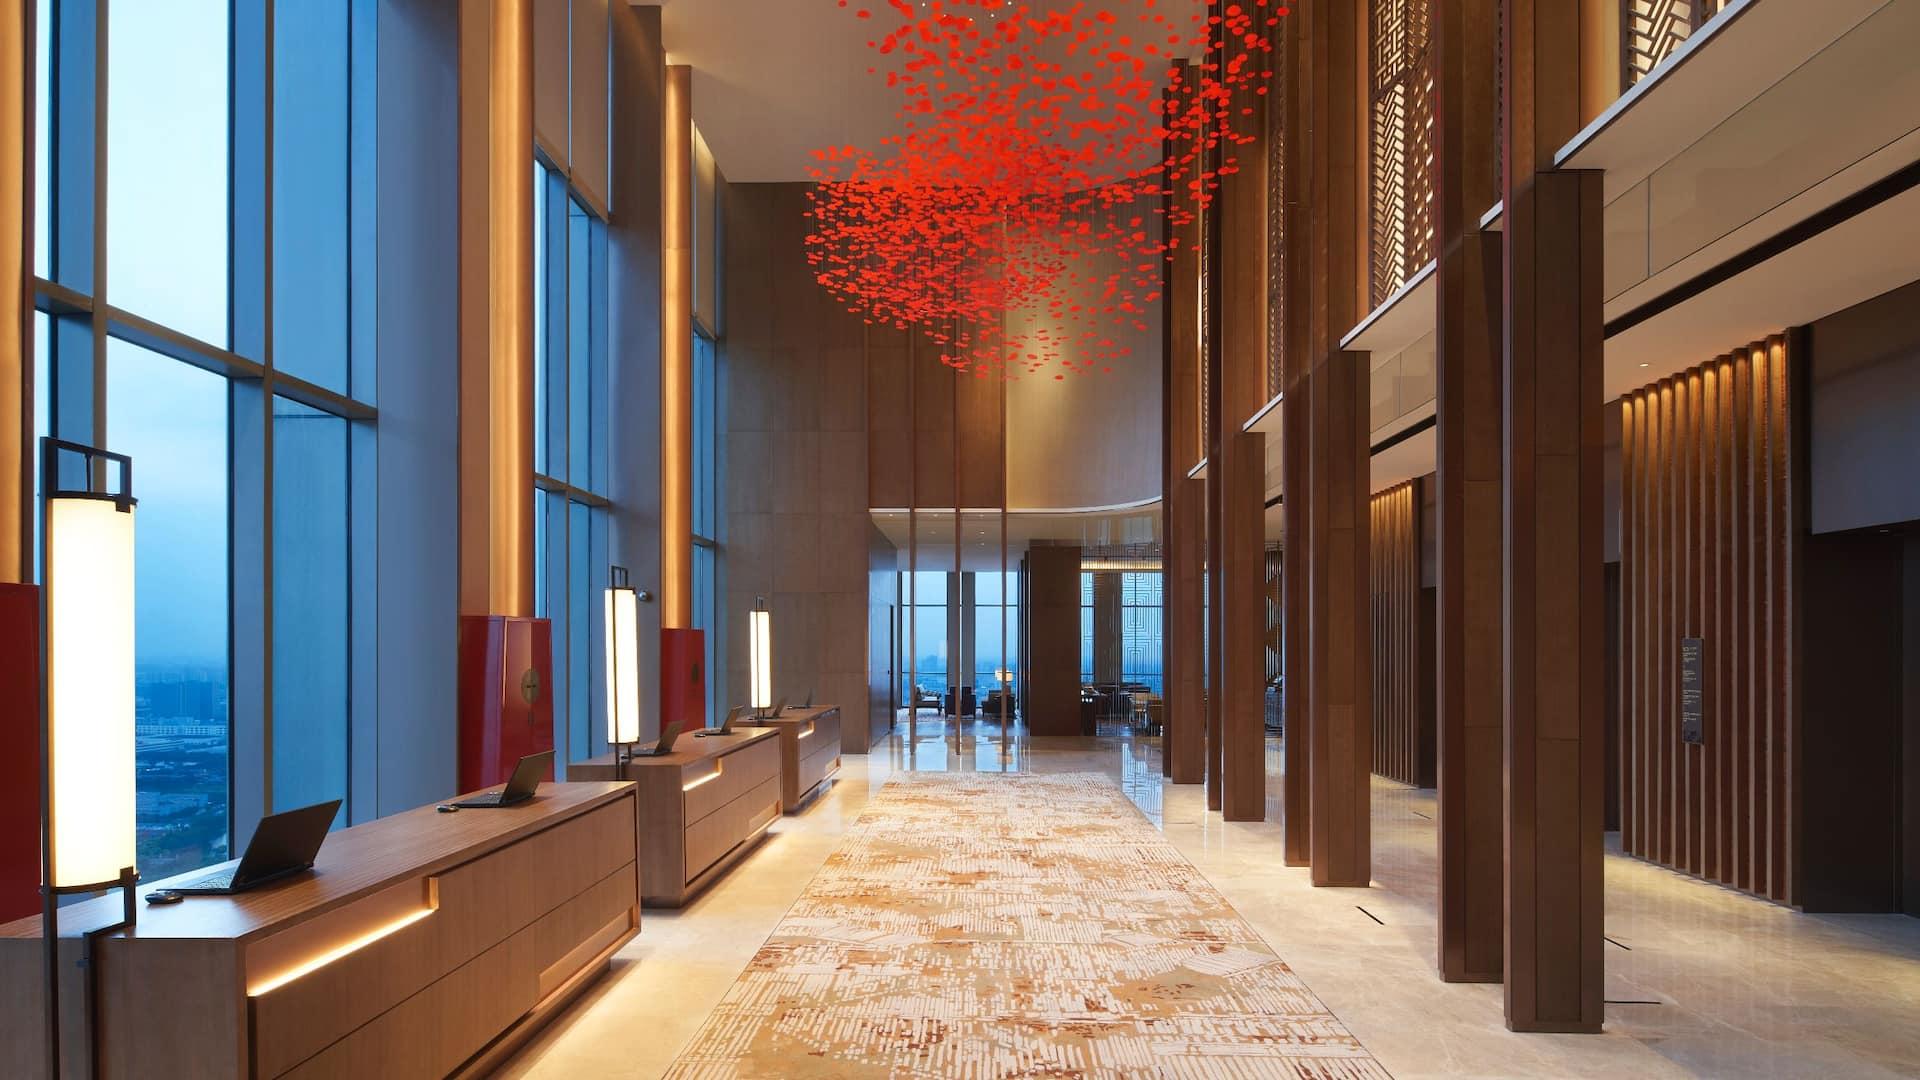 Hyatt Regency Shanghai Jiading hotel lobby